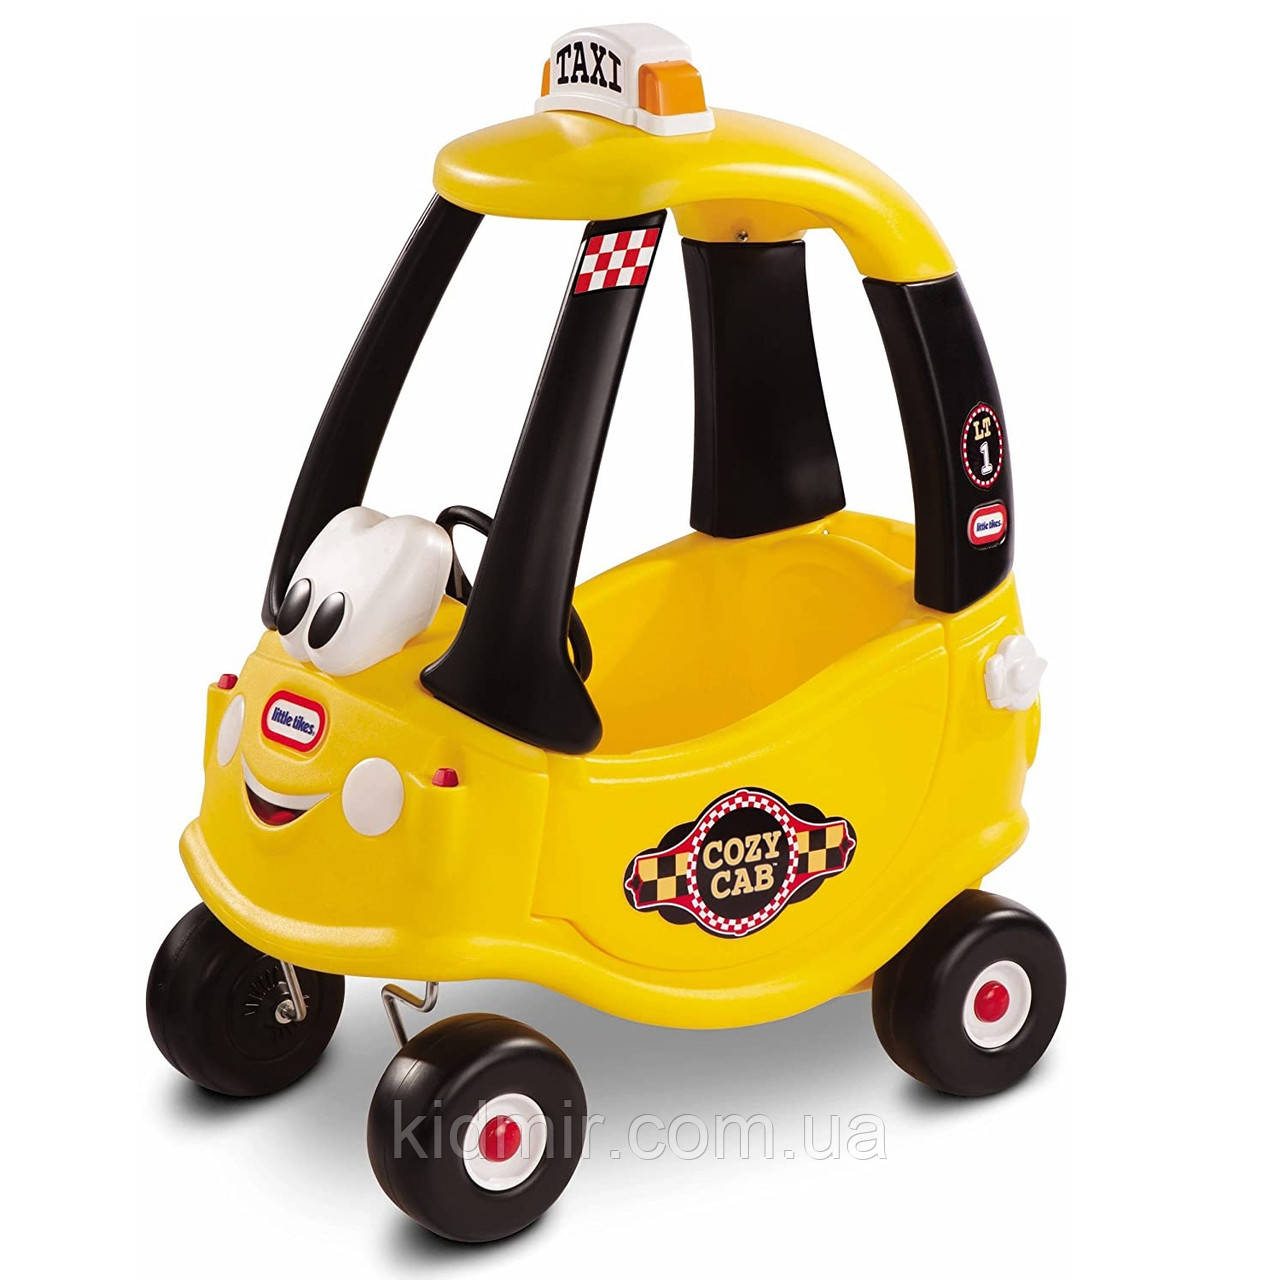 Машина каталка Такси Little Tikes 172175